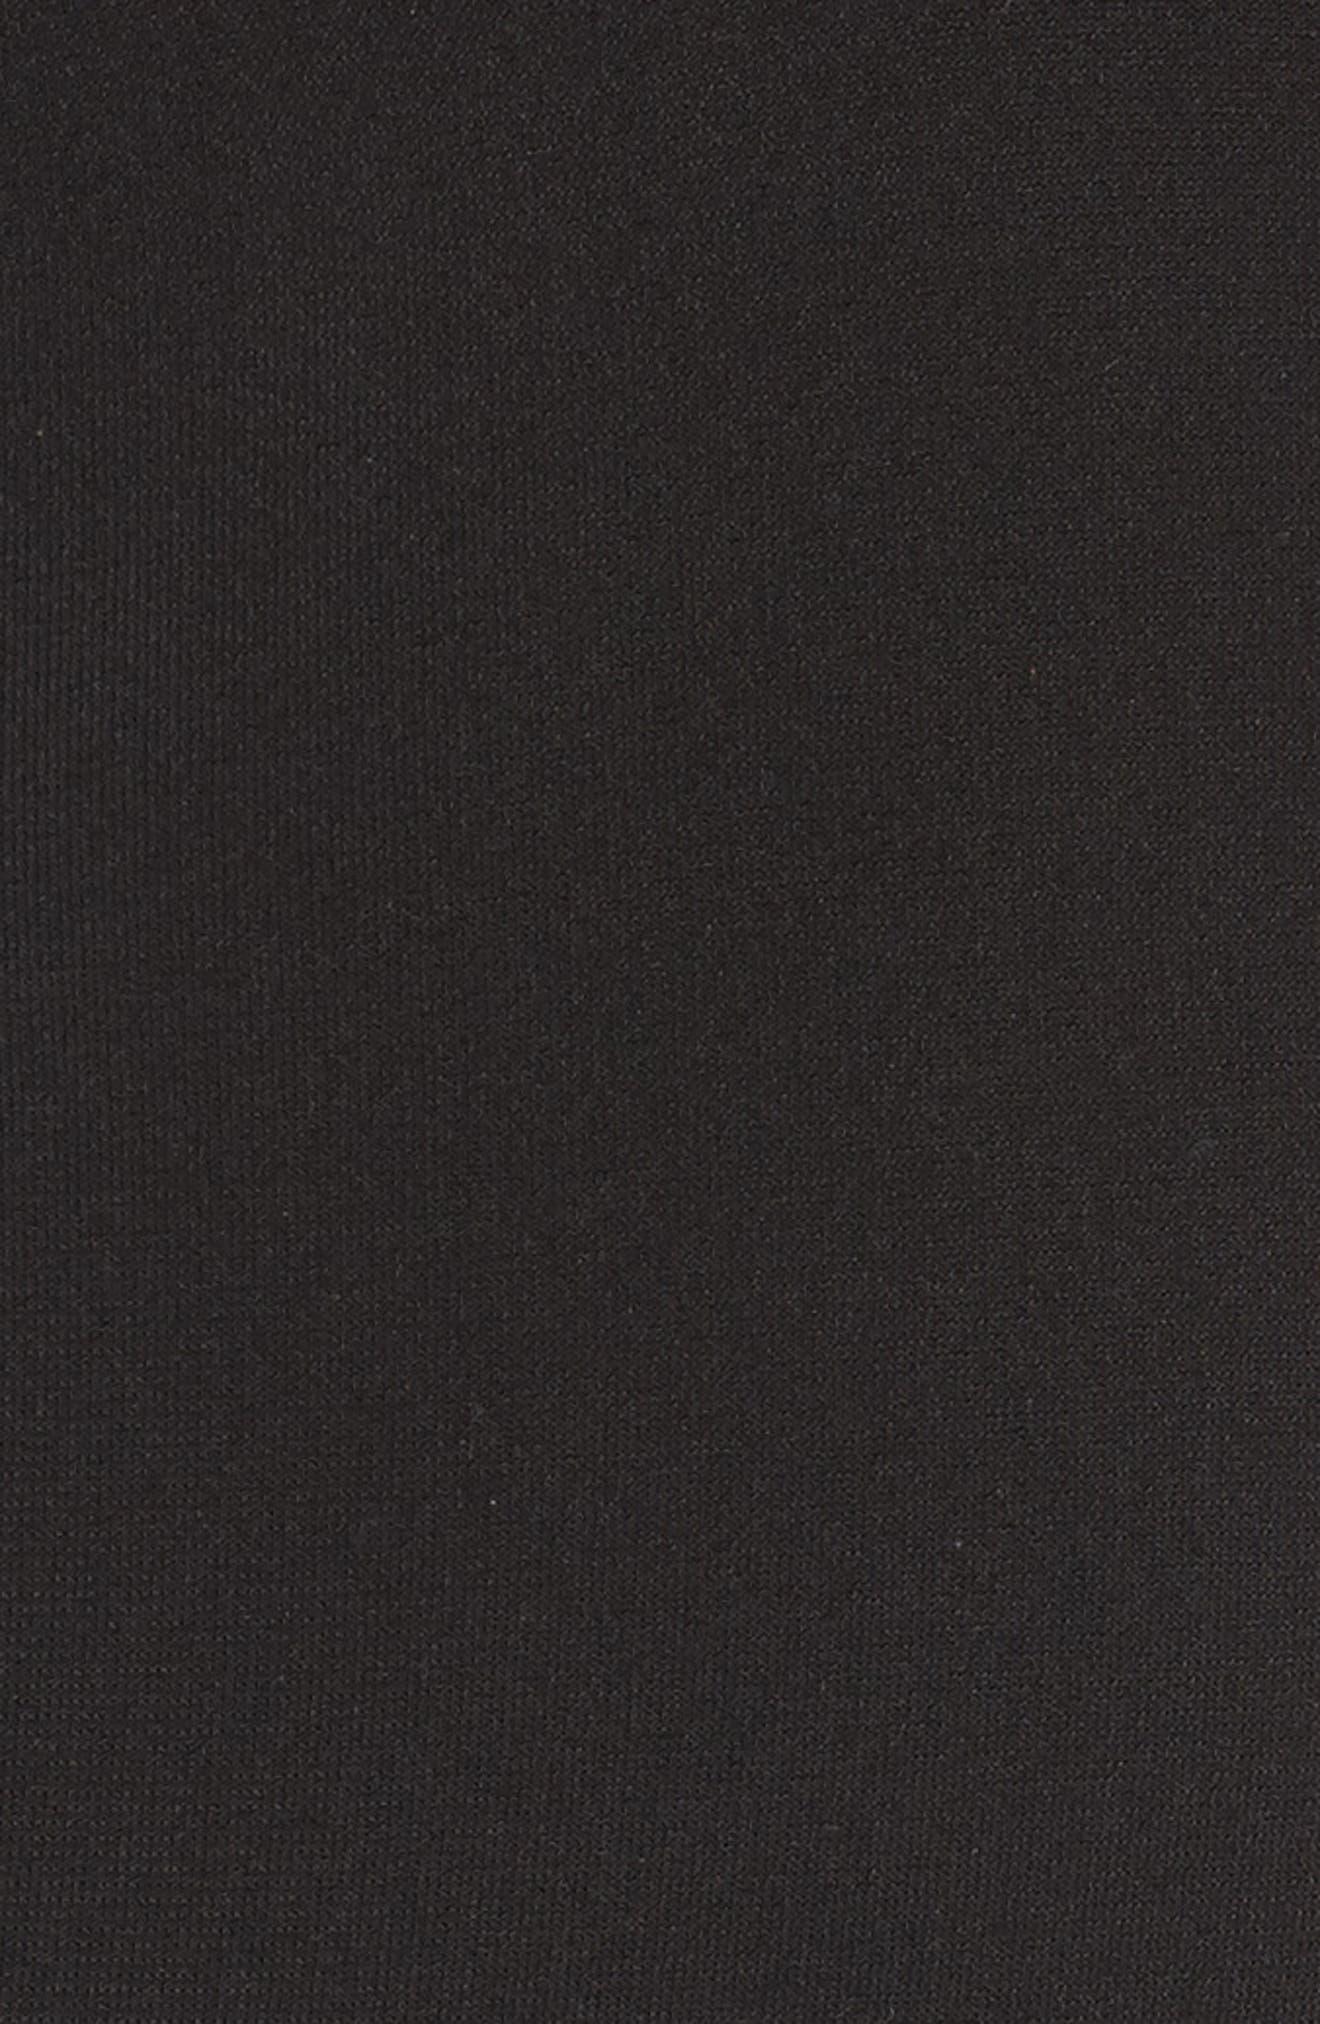 Patricia Strapless Bodysuit,                             Alternate thumbnail 5, color,                             Black